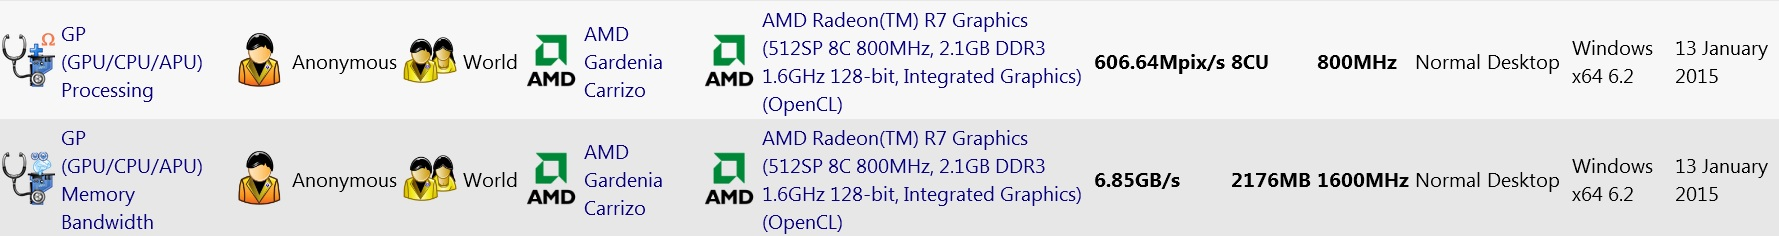 Media asset in full size related to 3dfxzone.it news item entitled as follows: La APU AMD Carrizo esibisce ottime performance in ambito grafico | Image Name: news22124_AMD-Carrizo-APU-Benchmarks_1.jpg